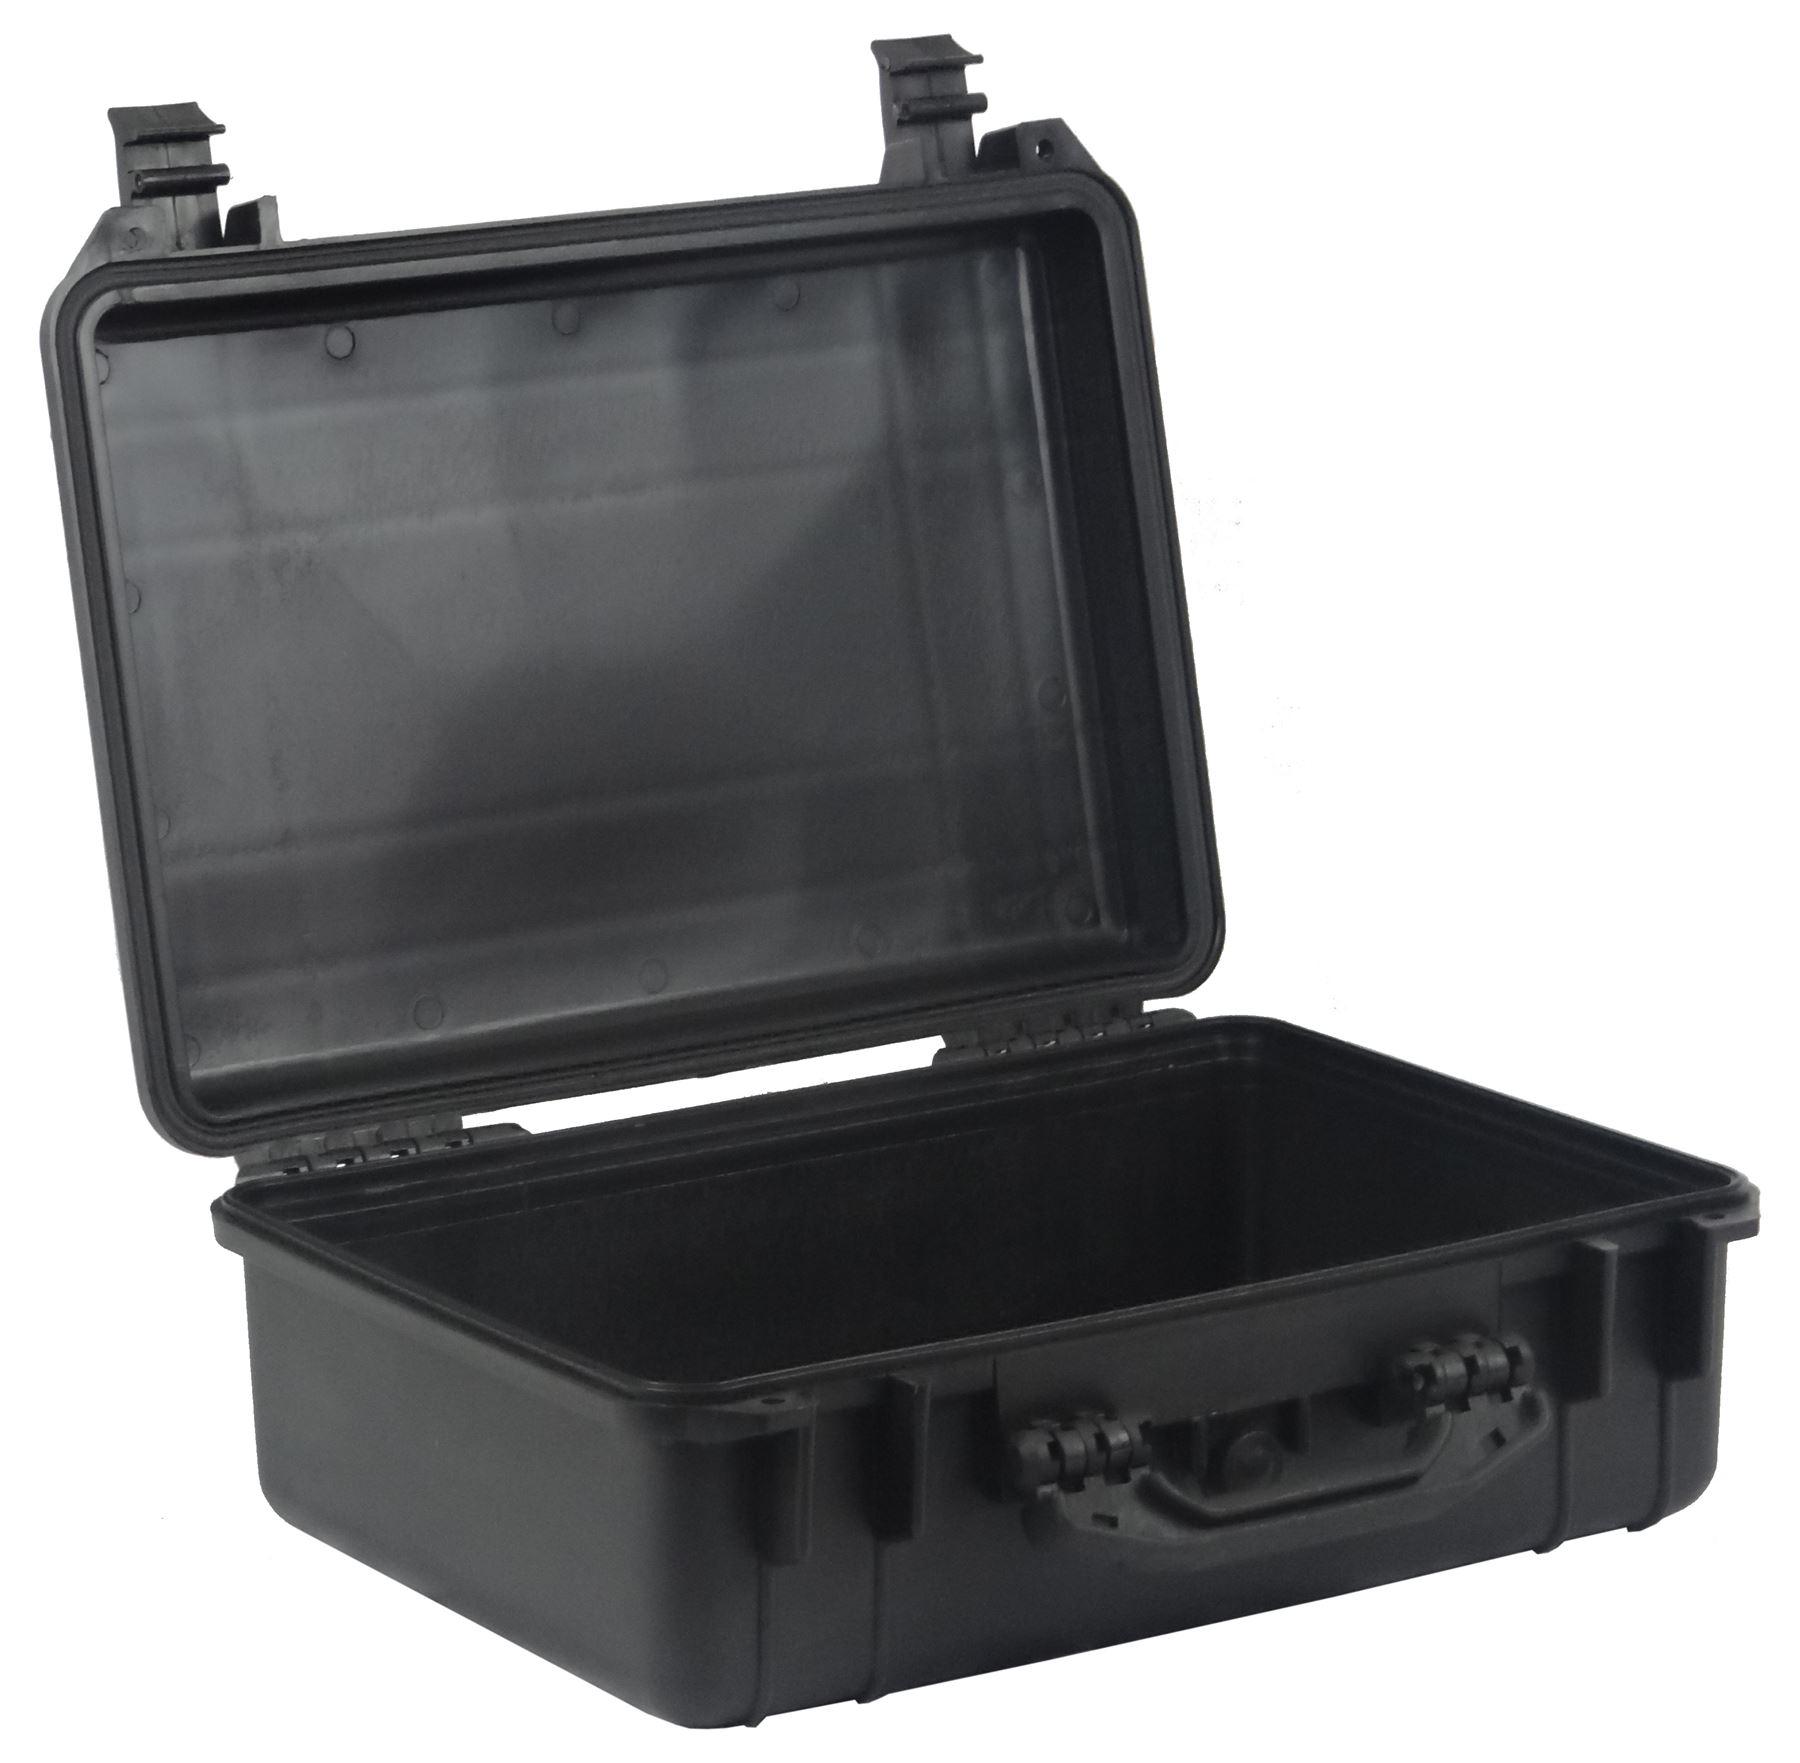 Waterproof Equipment Hard Carry Flight Case Watertight